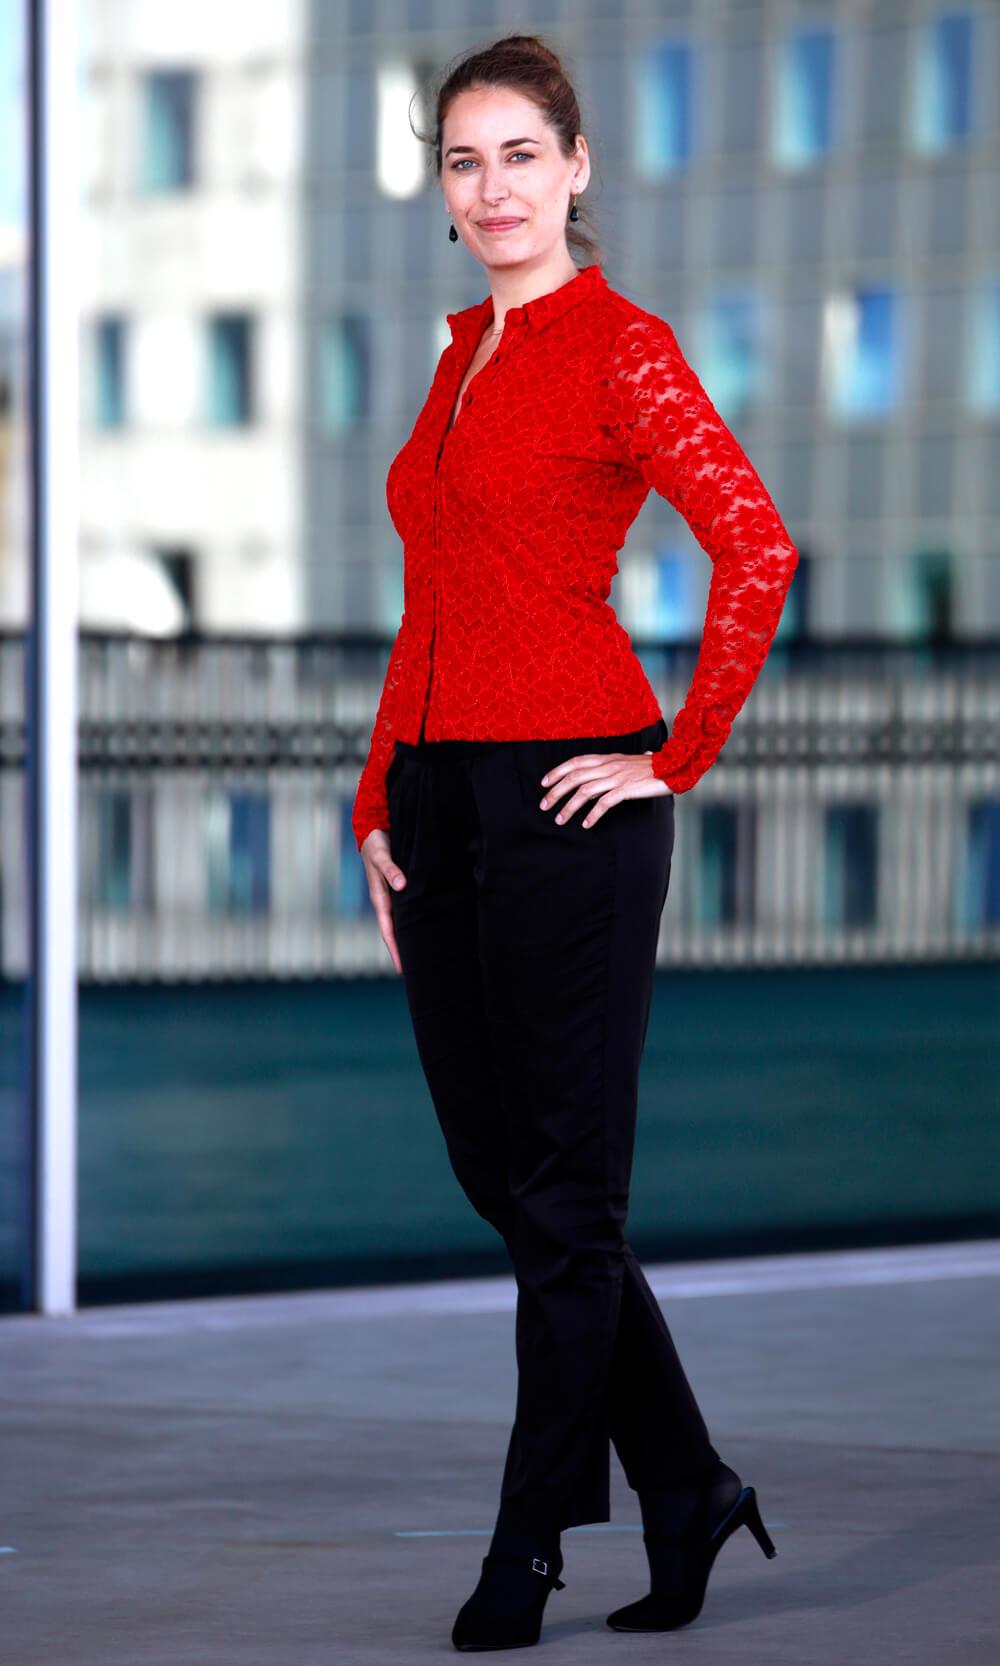 Rød blondeskjorte